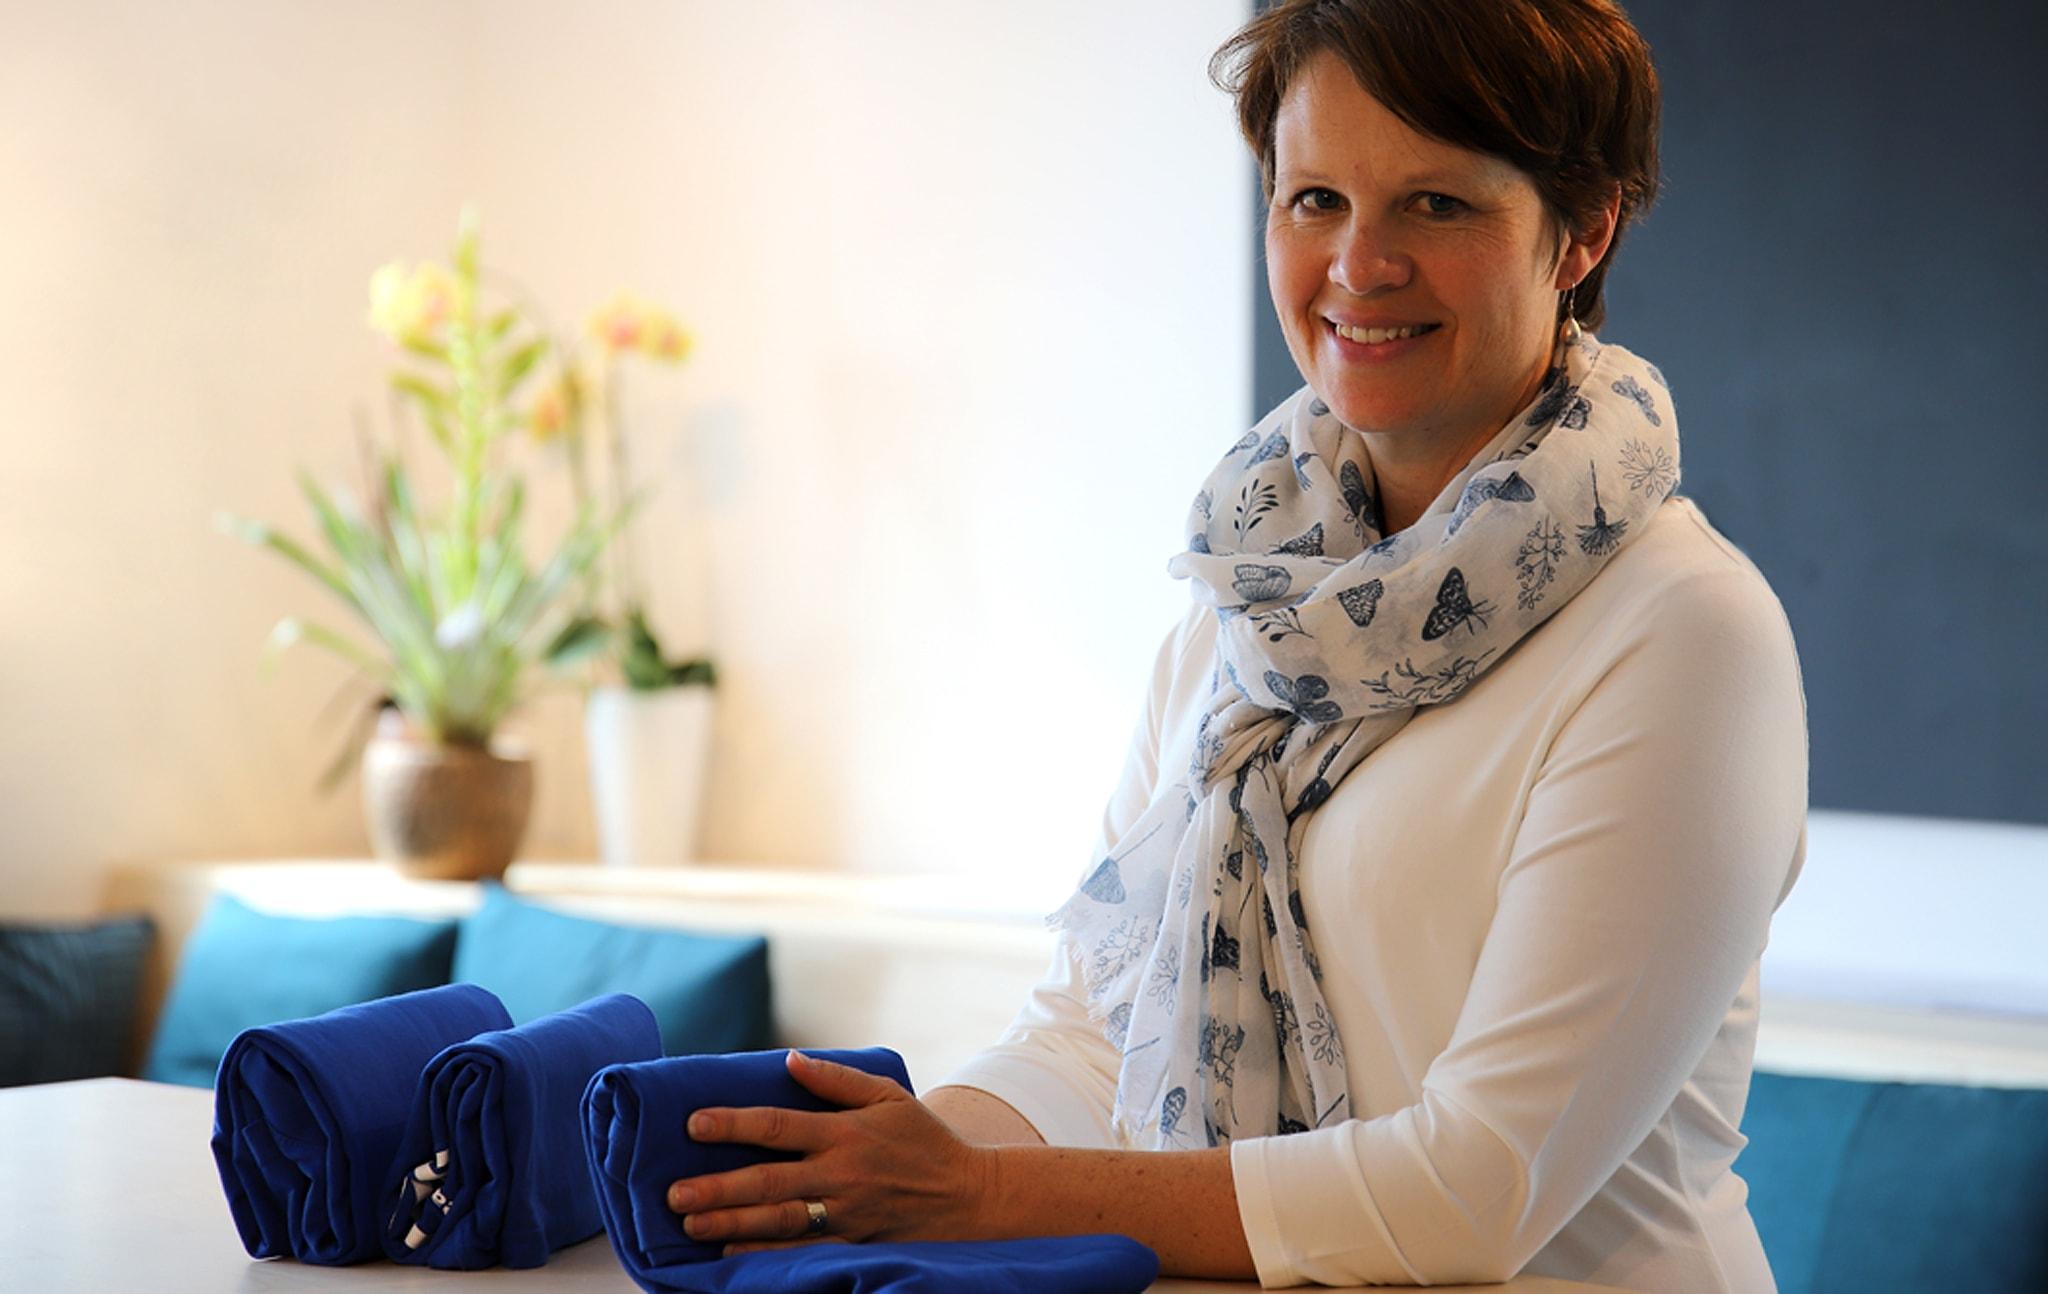 Wanita duduk dekat meja sambil tersenyum ke arah kamera, sambil melipat tekstil.